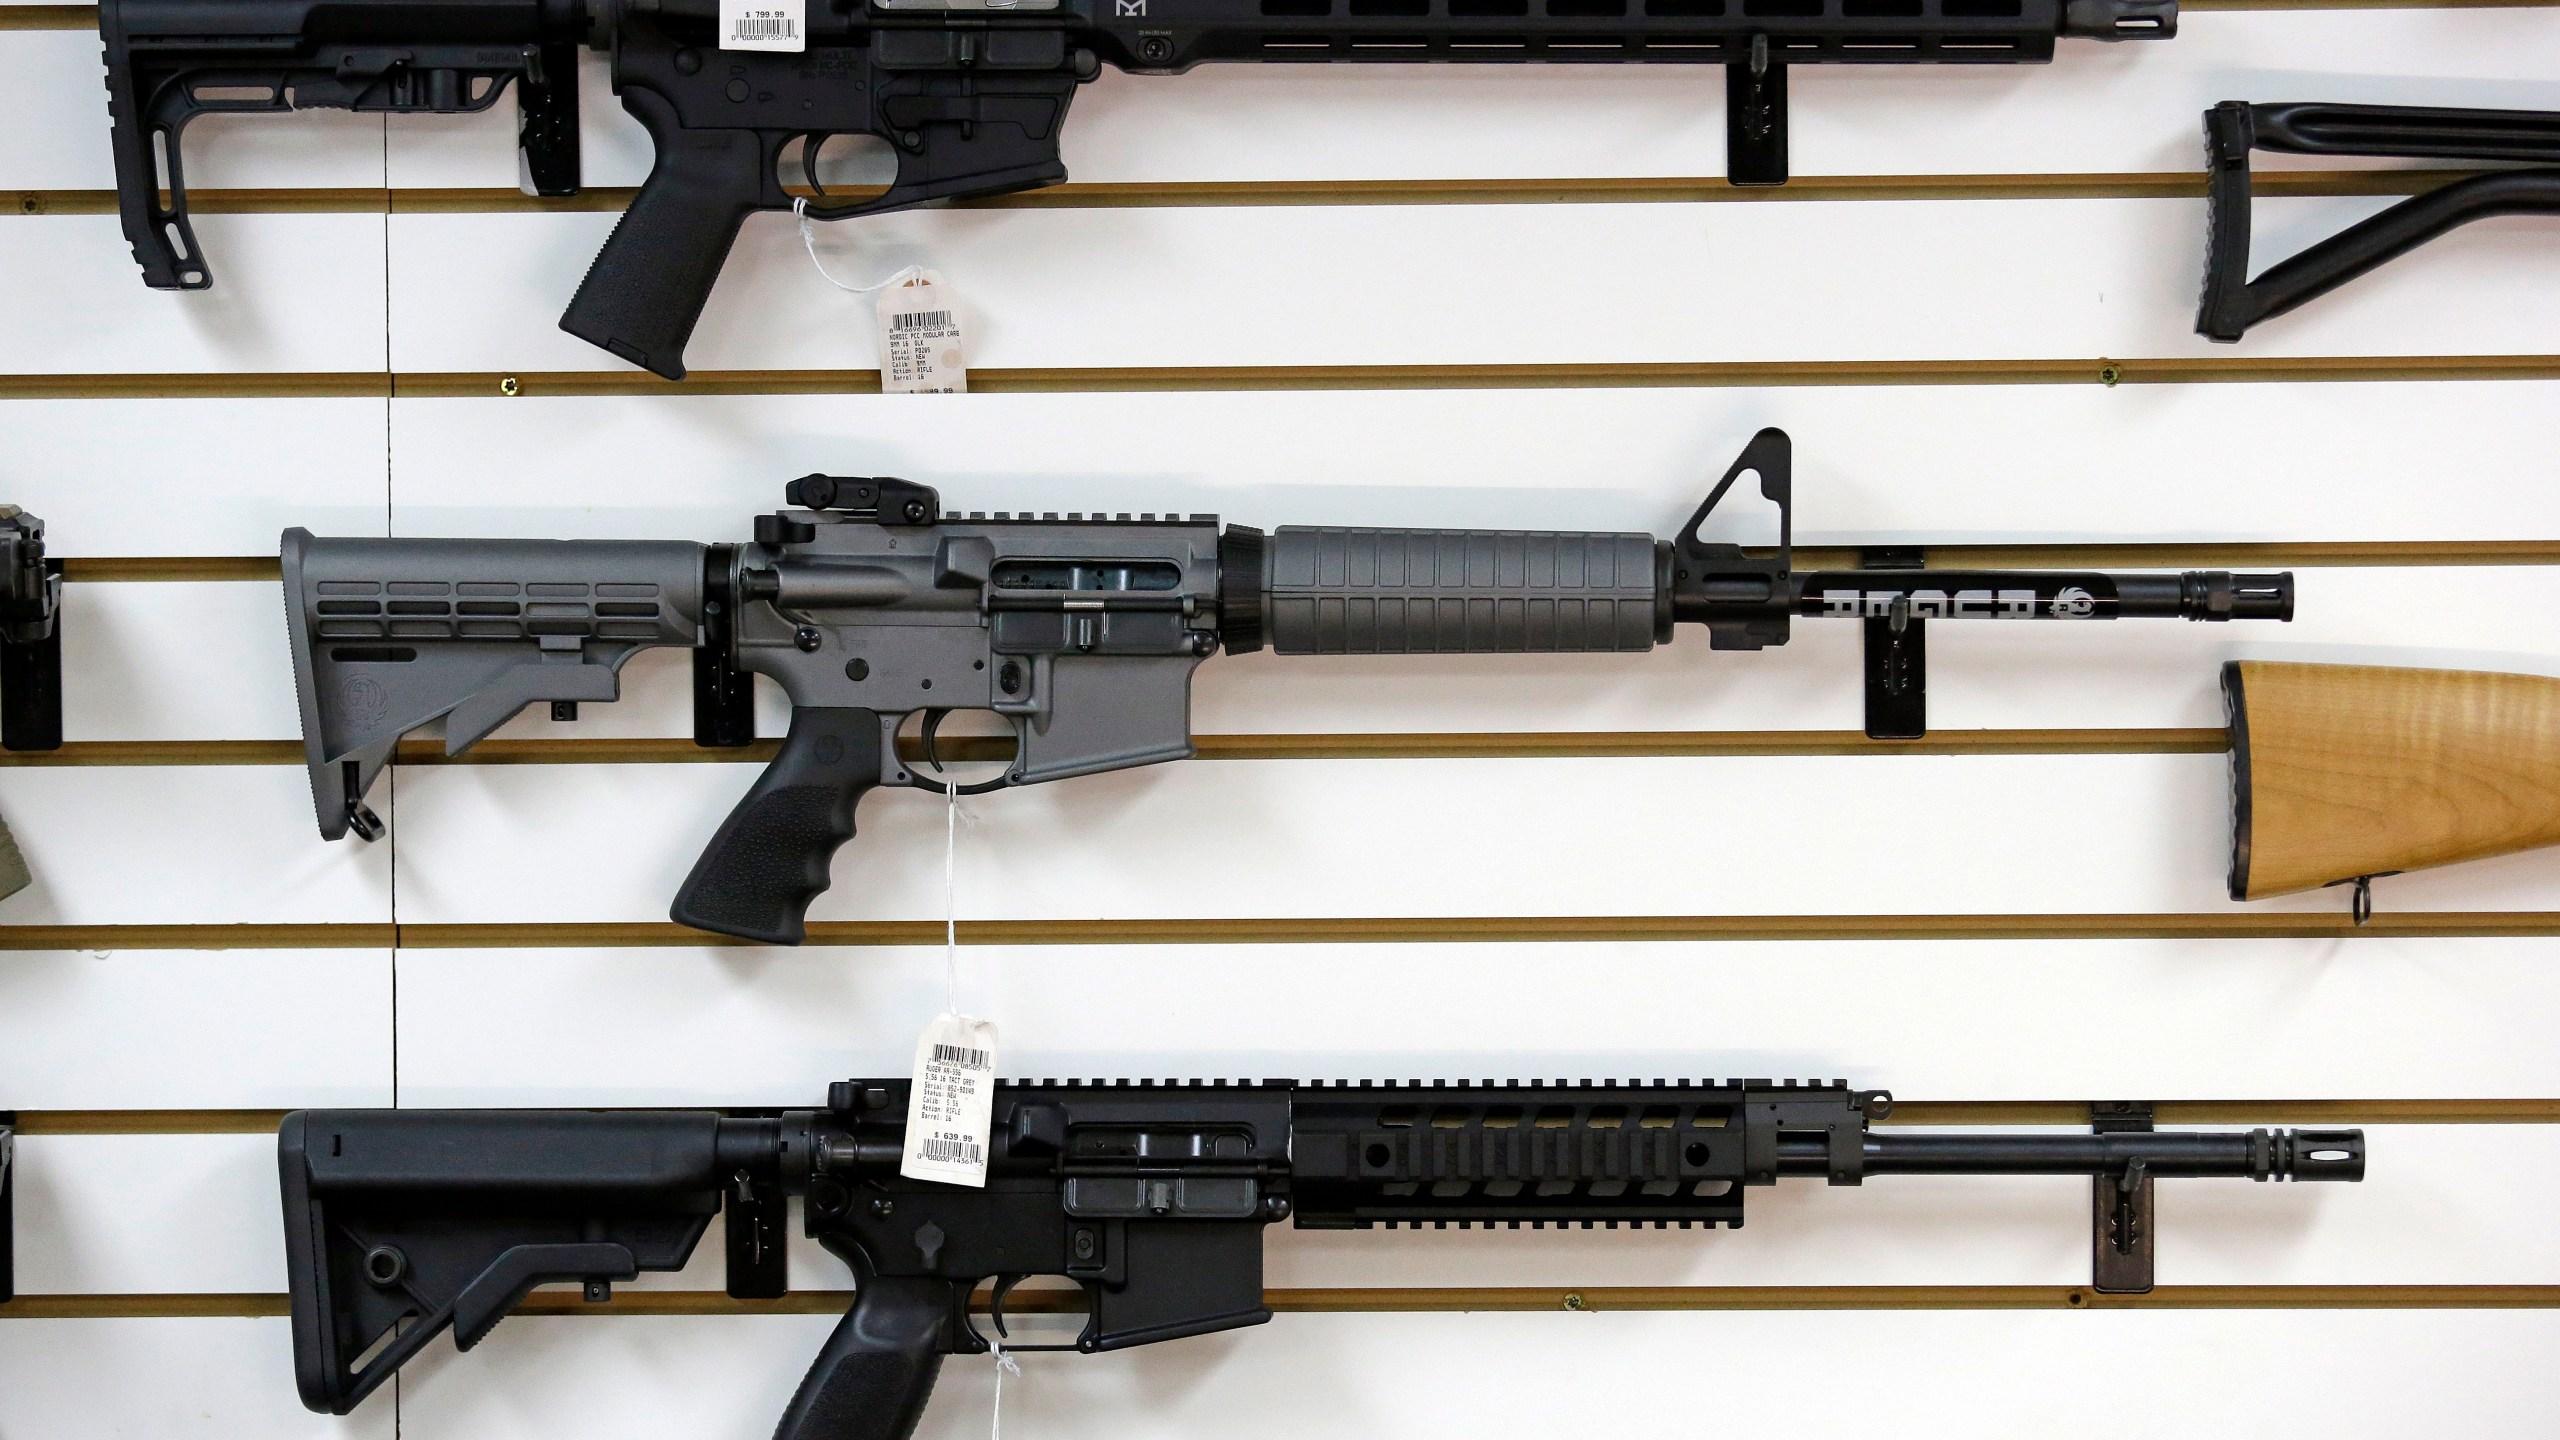 AR-15 rifle Shooting Gun Debate